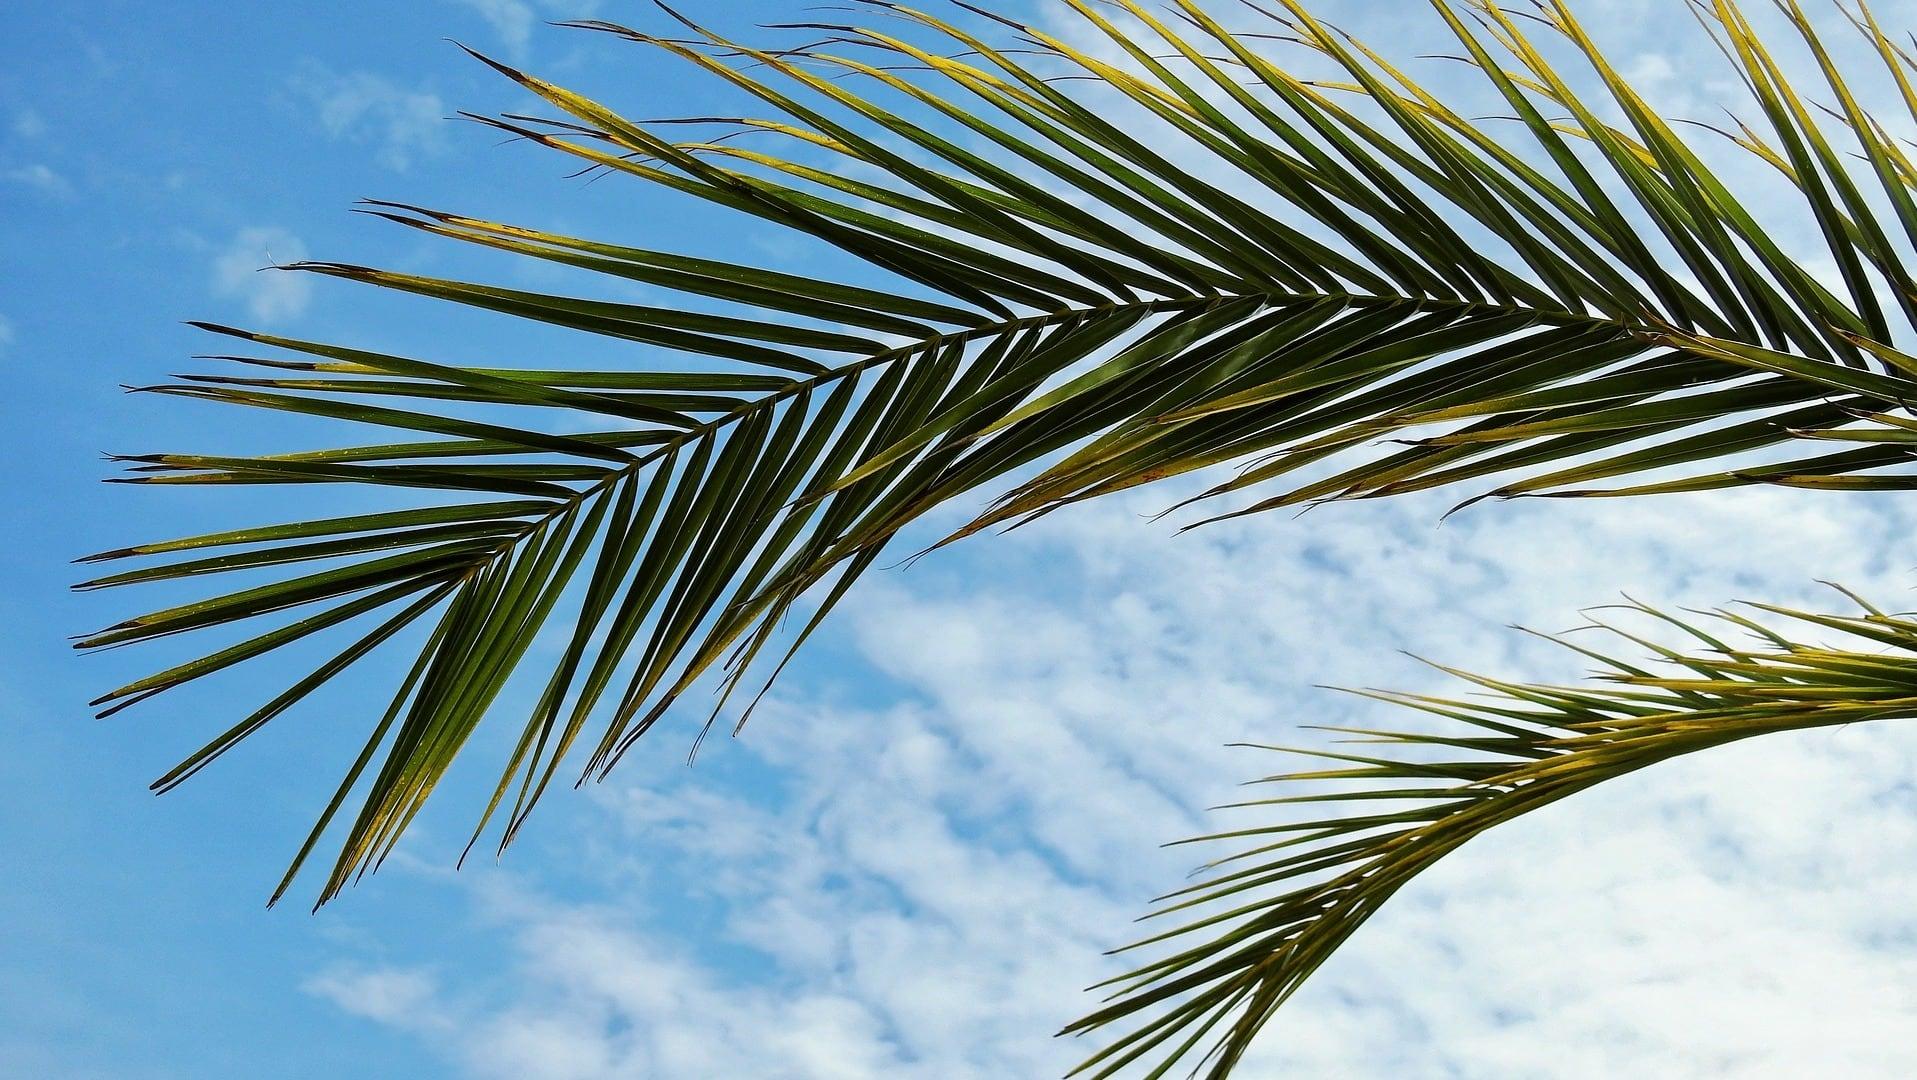 Palmenblätter vor blauem Himmel